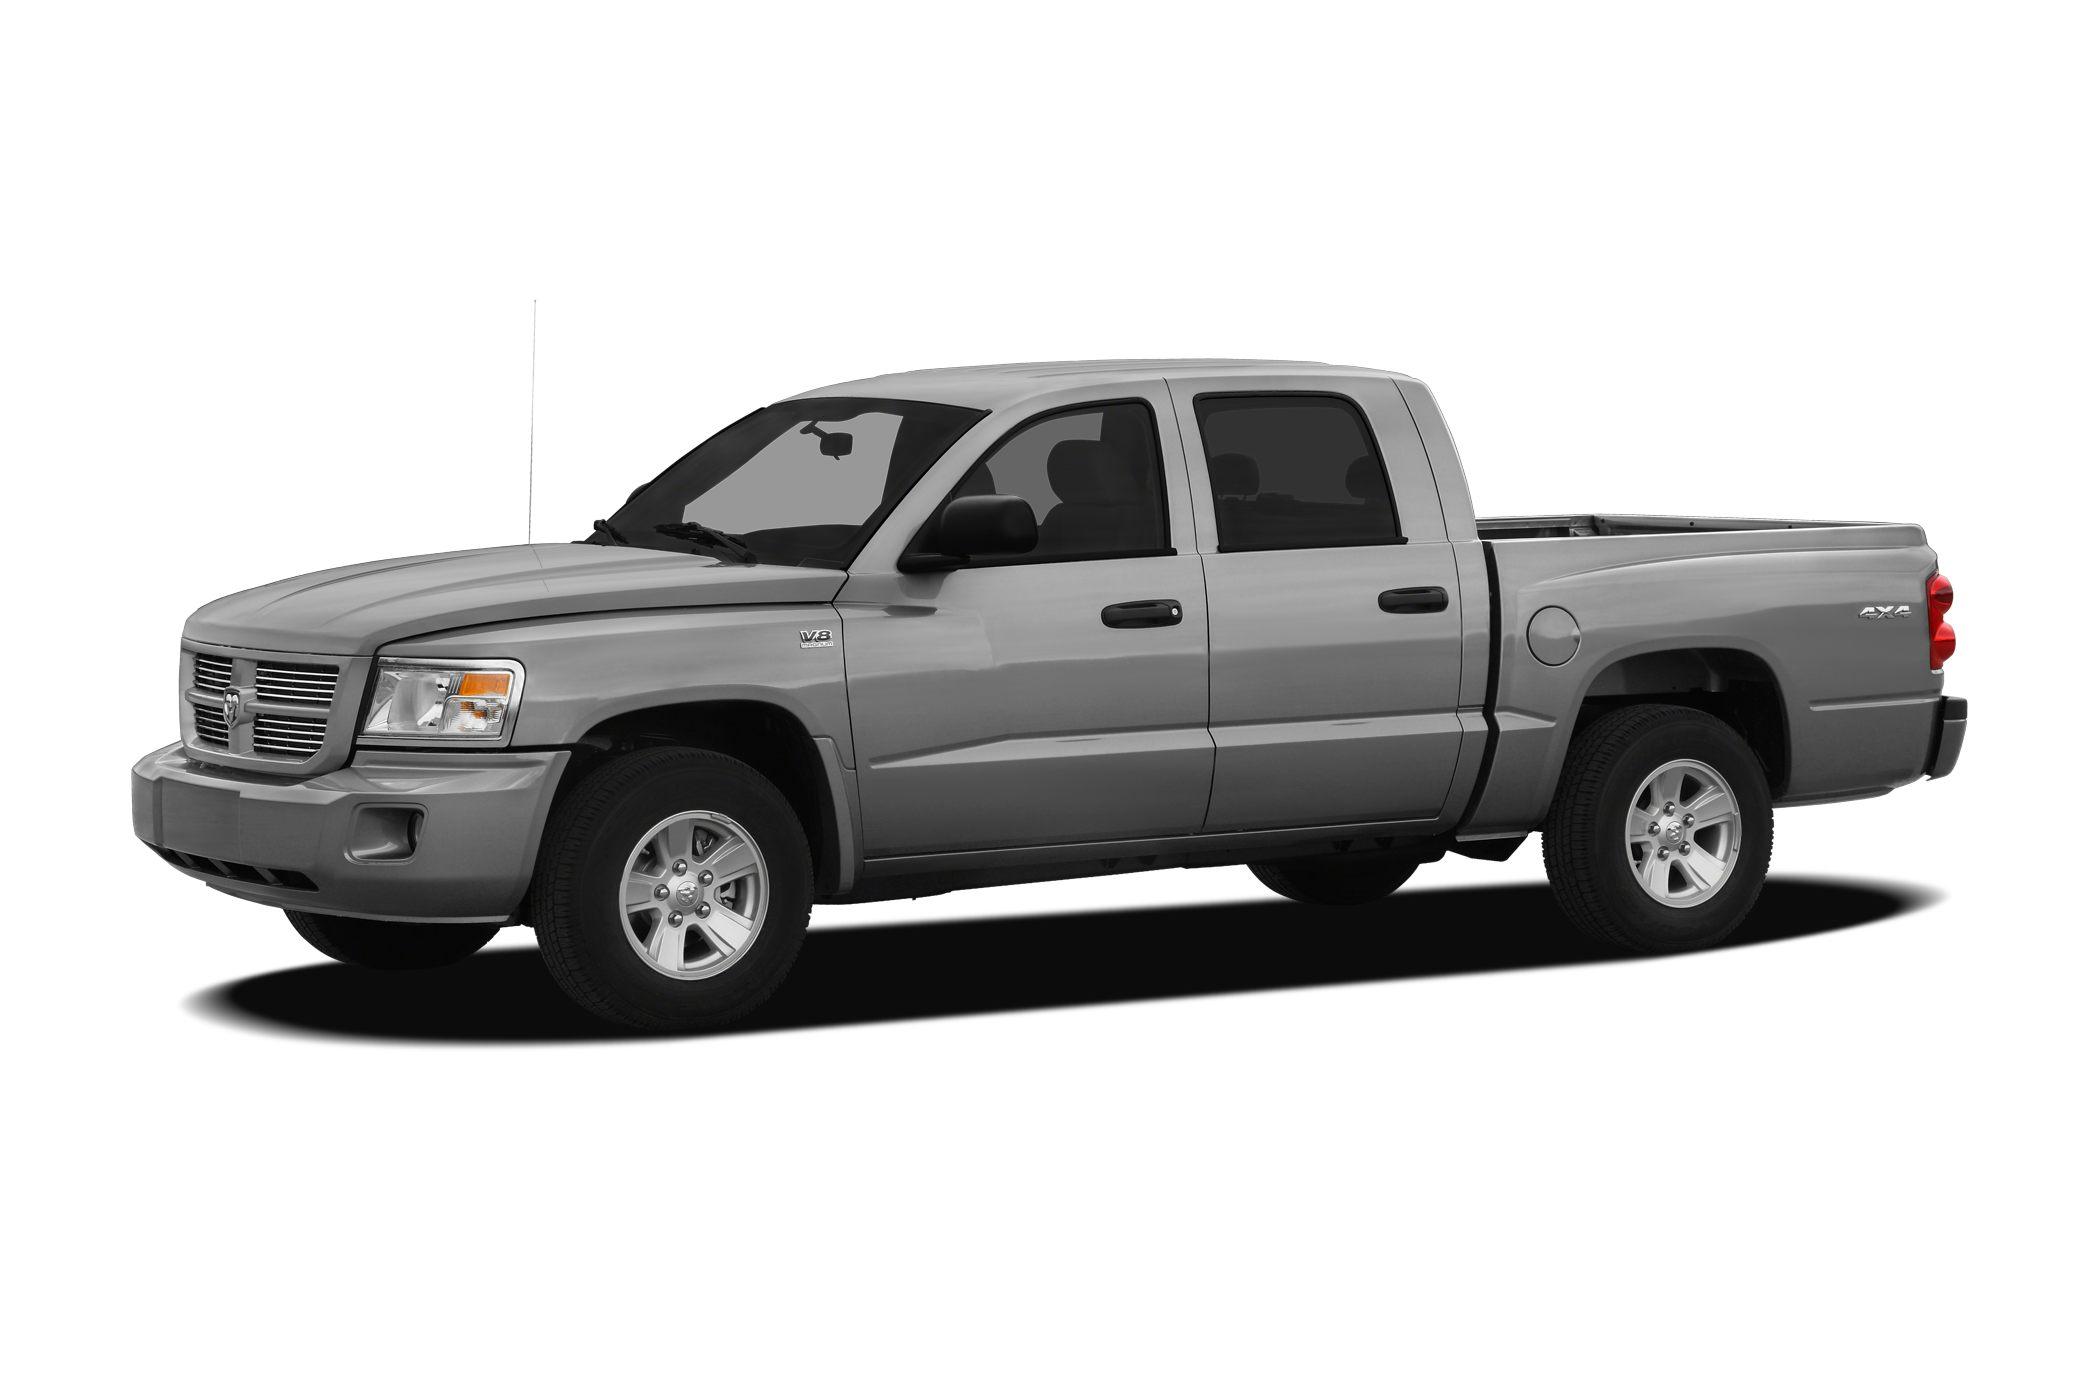 2010 Dodge Dakota TRX Crew Cab Pickup for sale in Longmont for $21,000 with 50,178 miles